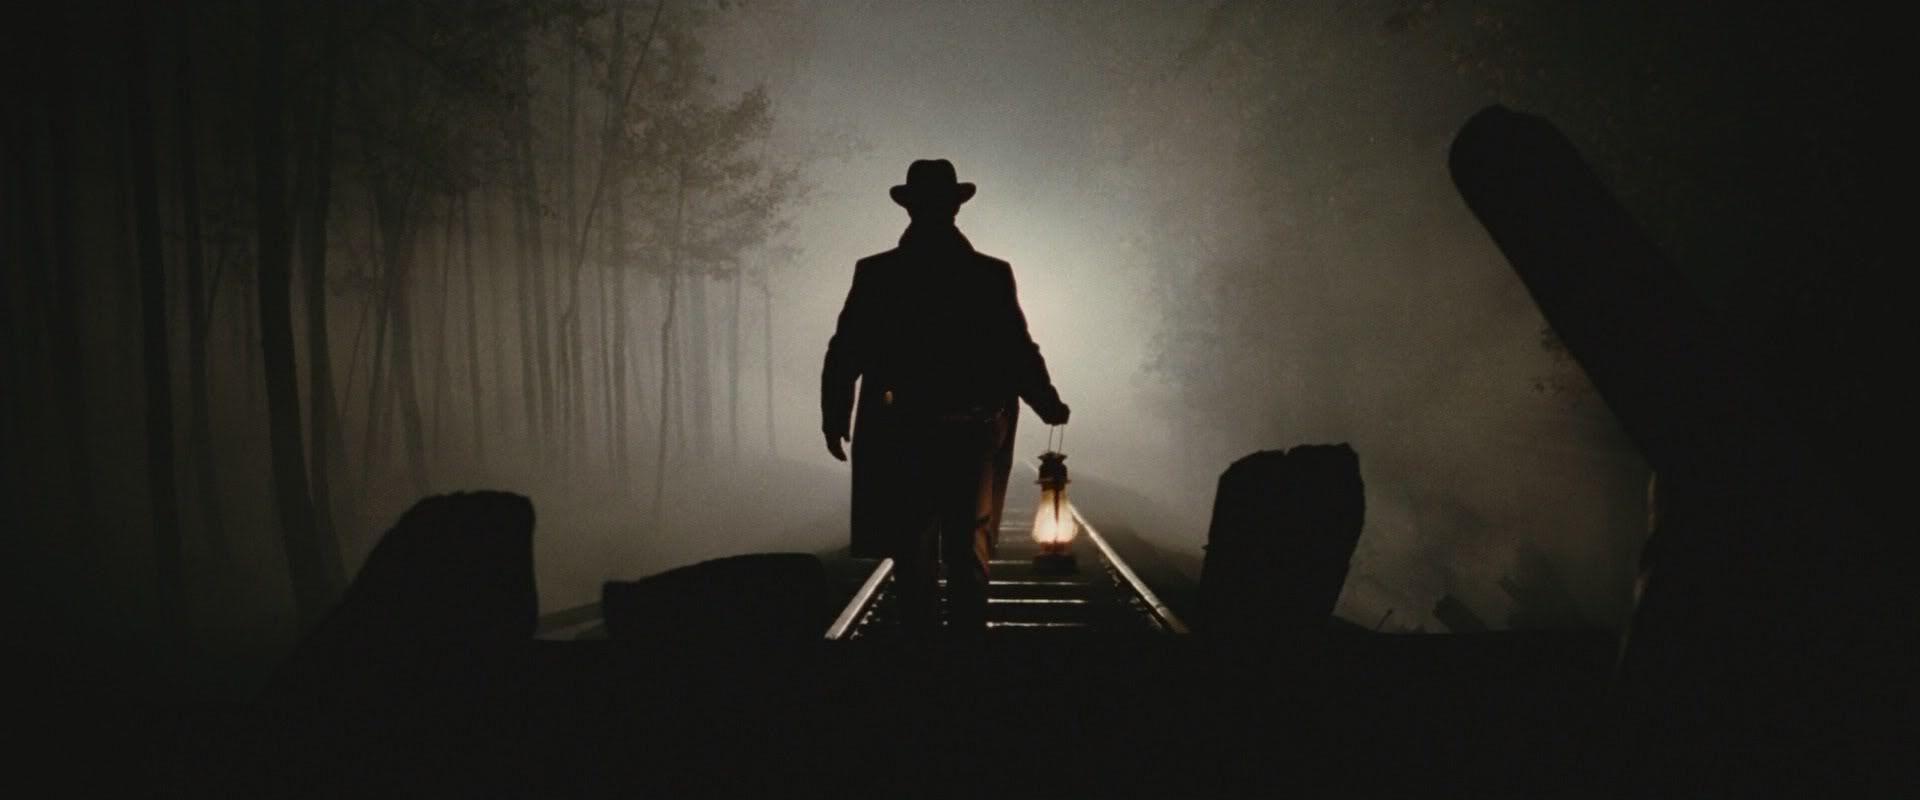 fog machine for filmmaking